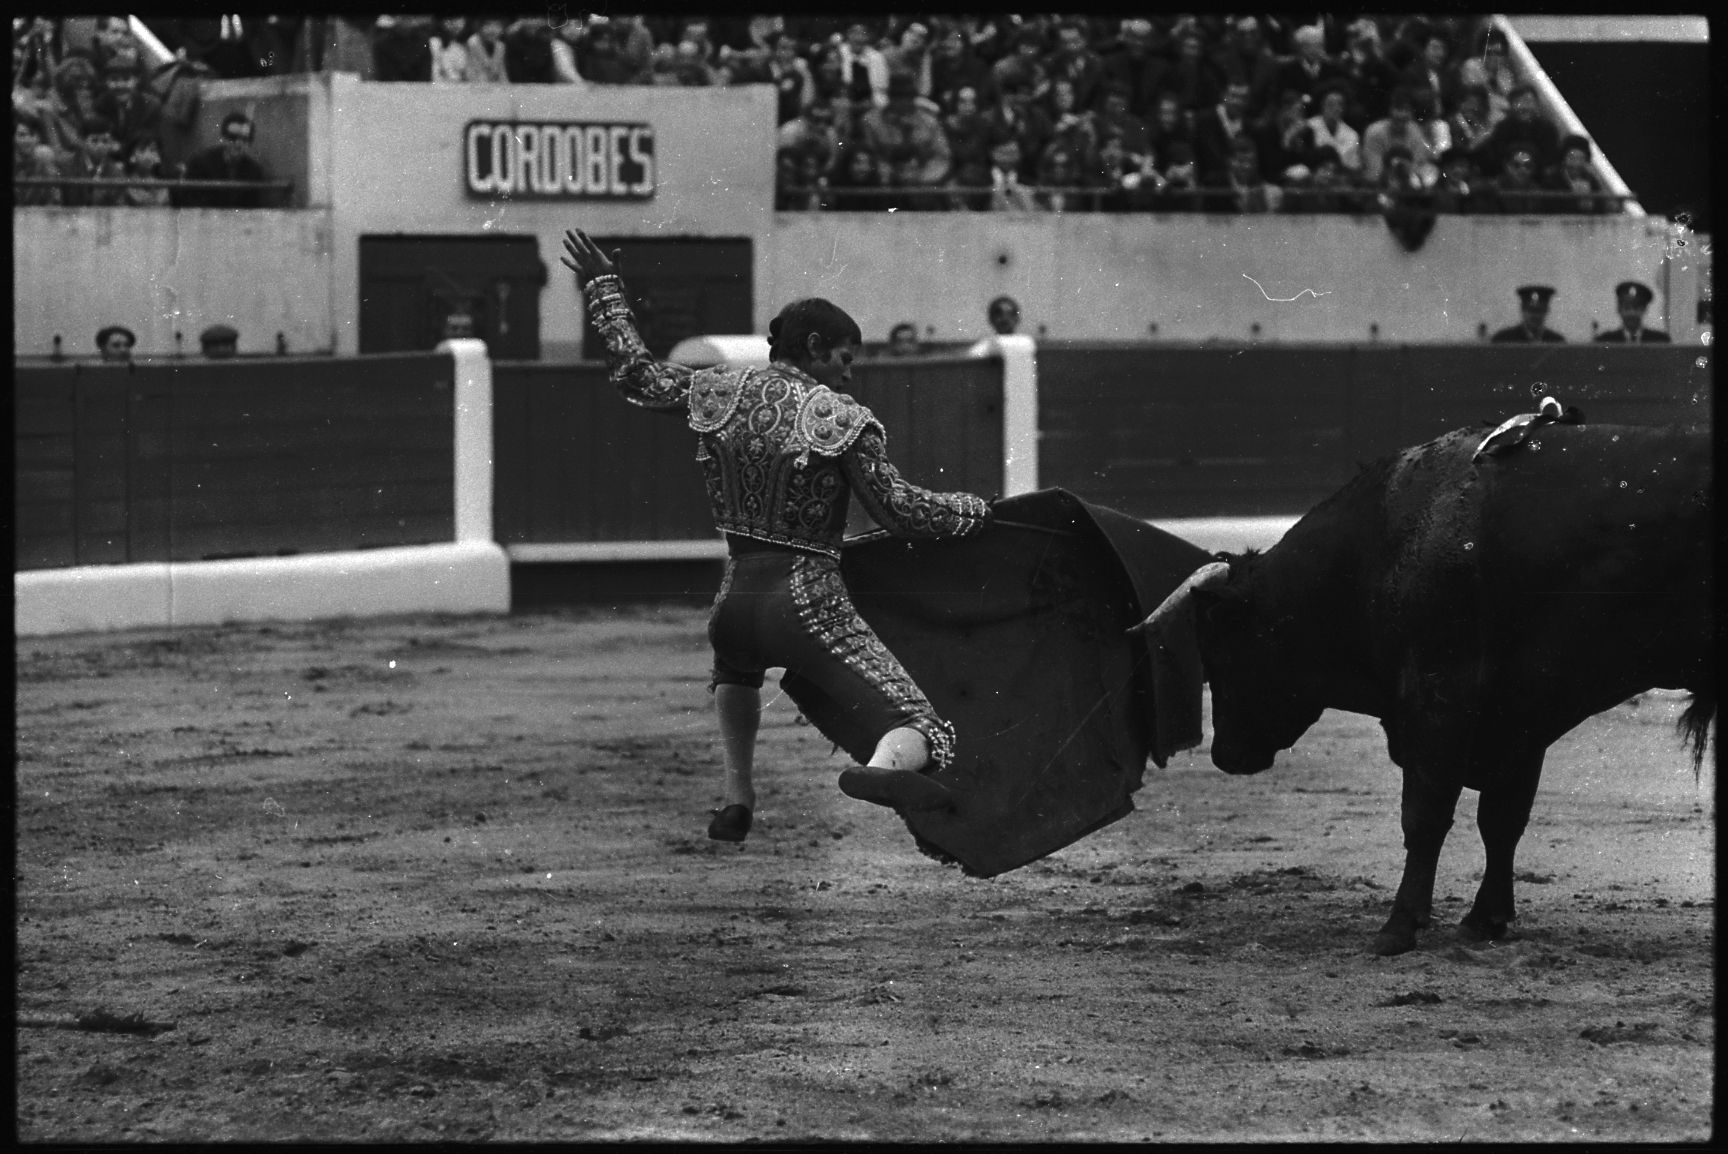 Corrida Image file:5.5.68. corrida. el cordobés (1968) - 53fi5893 - wikimedia